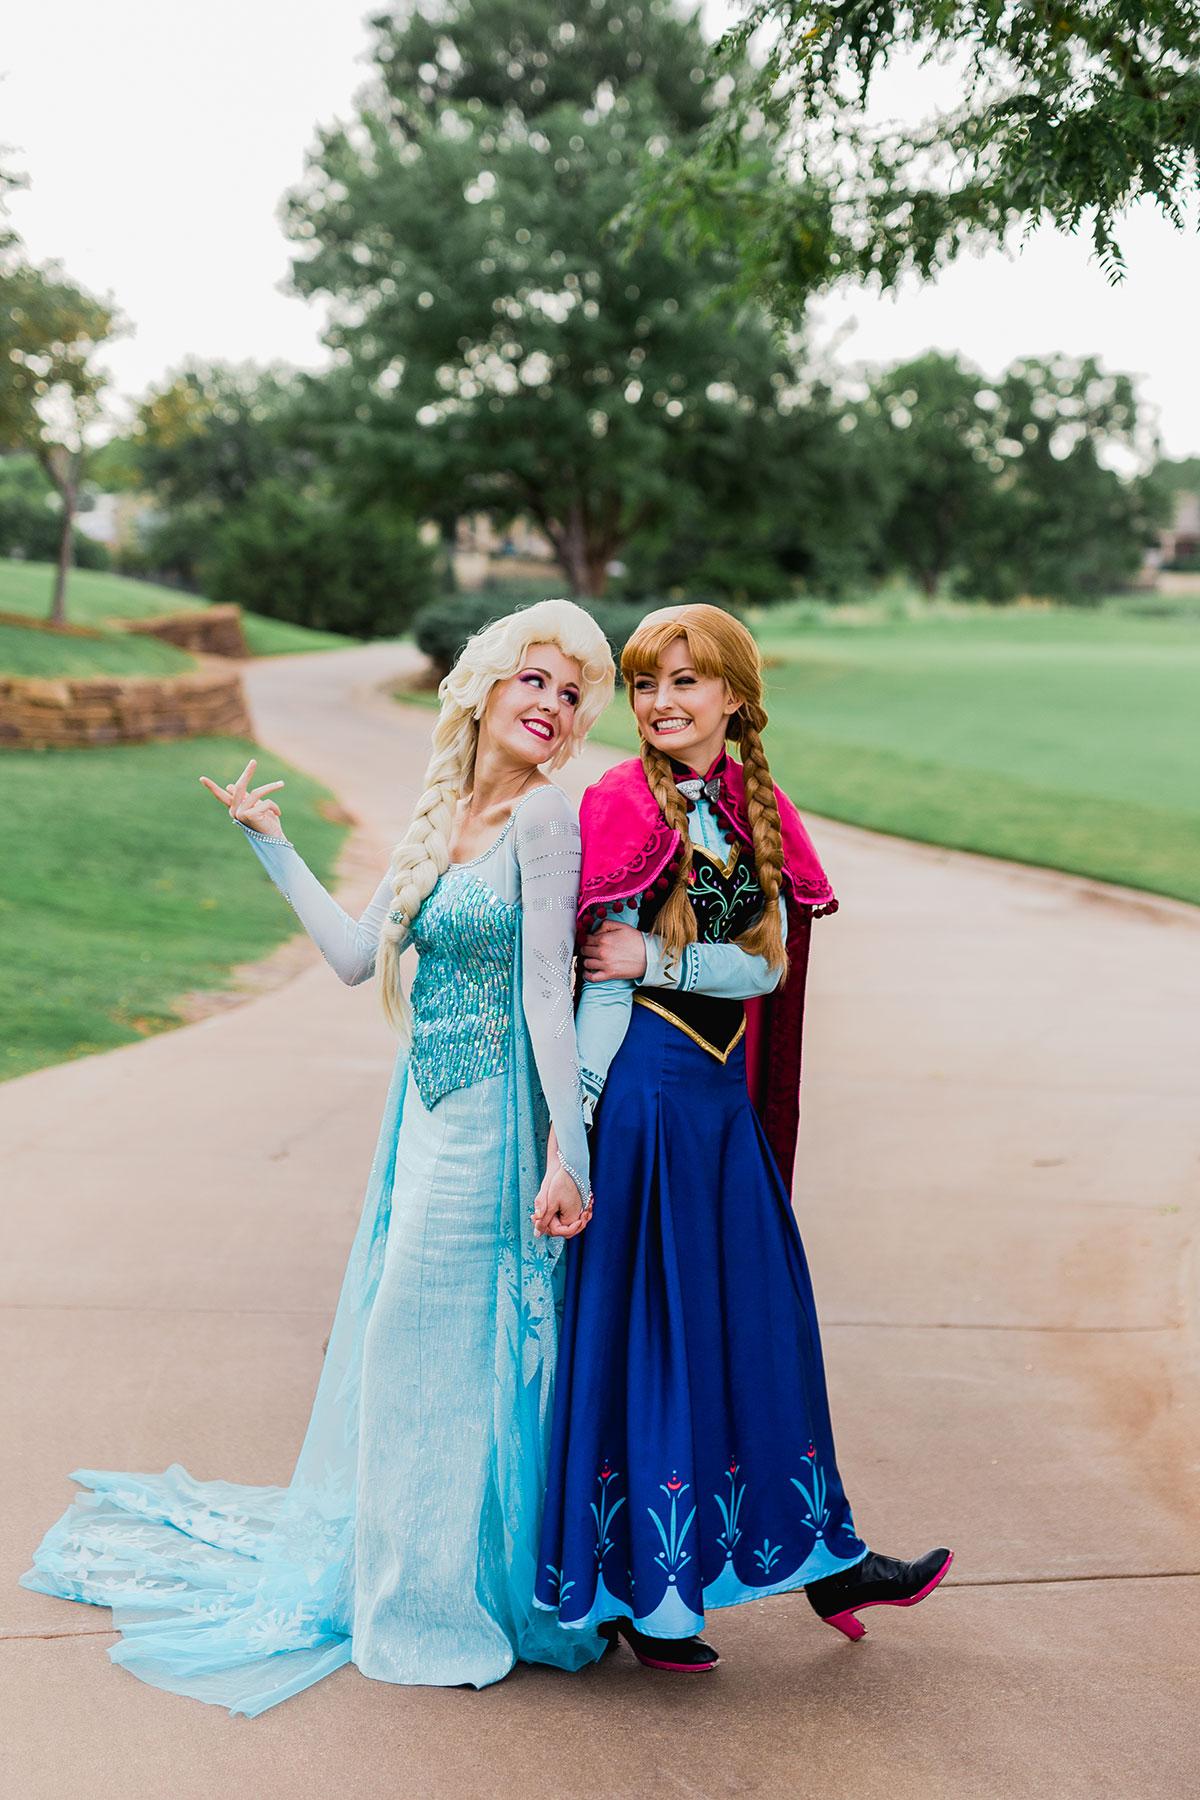 Anna&Elsa.jpg